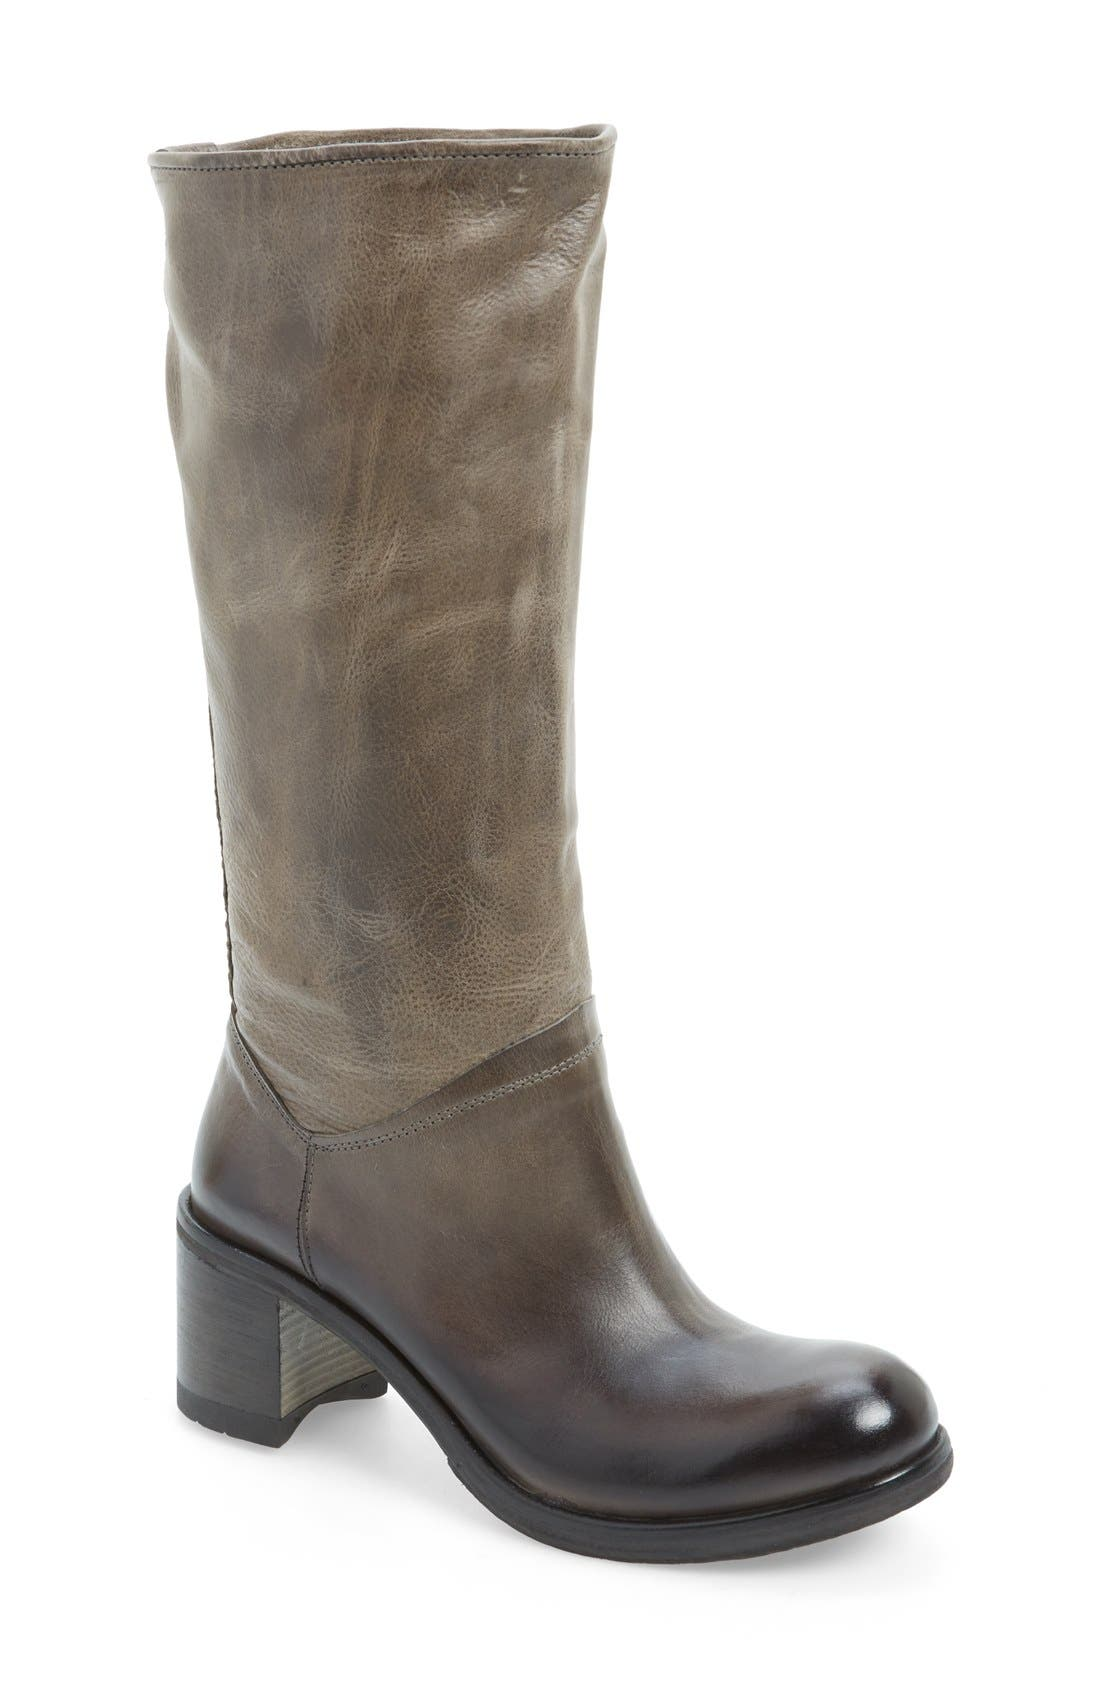 Main Image - KBR Knee-High Boot (Women)